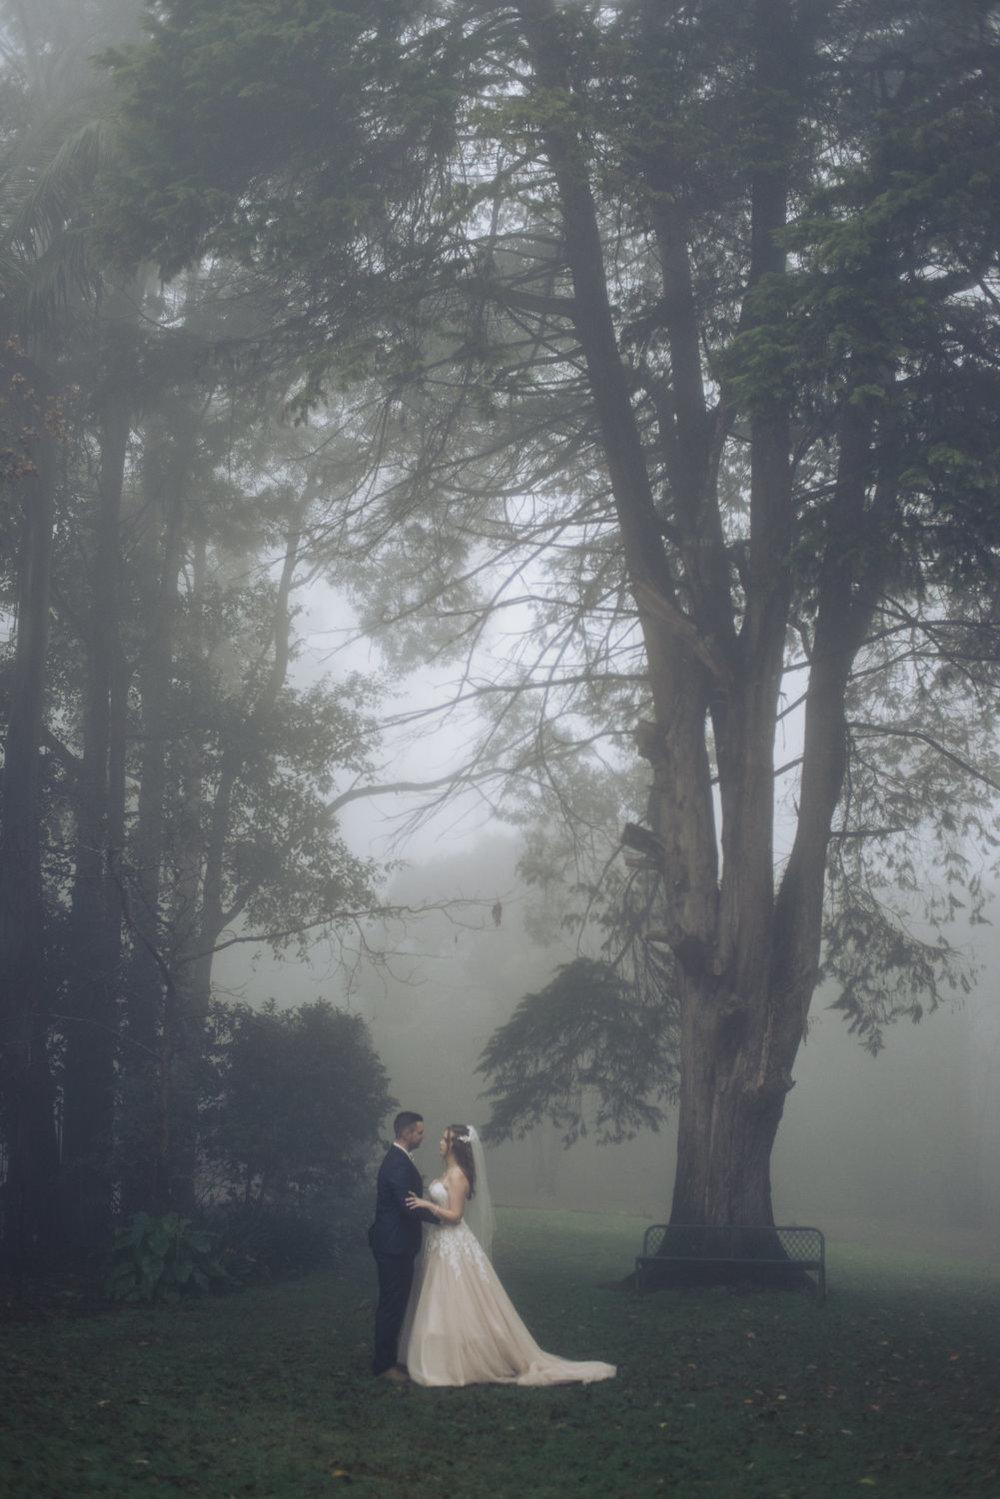 Mt-tamborine-wedding-st-bernards-79.jpg